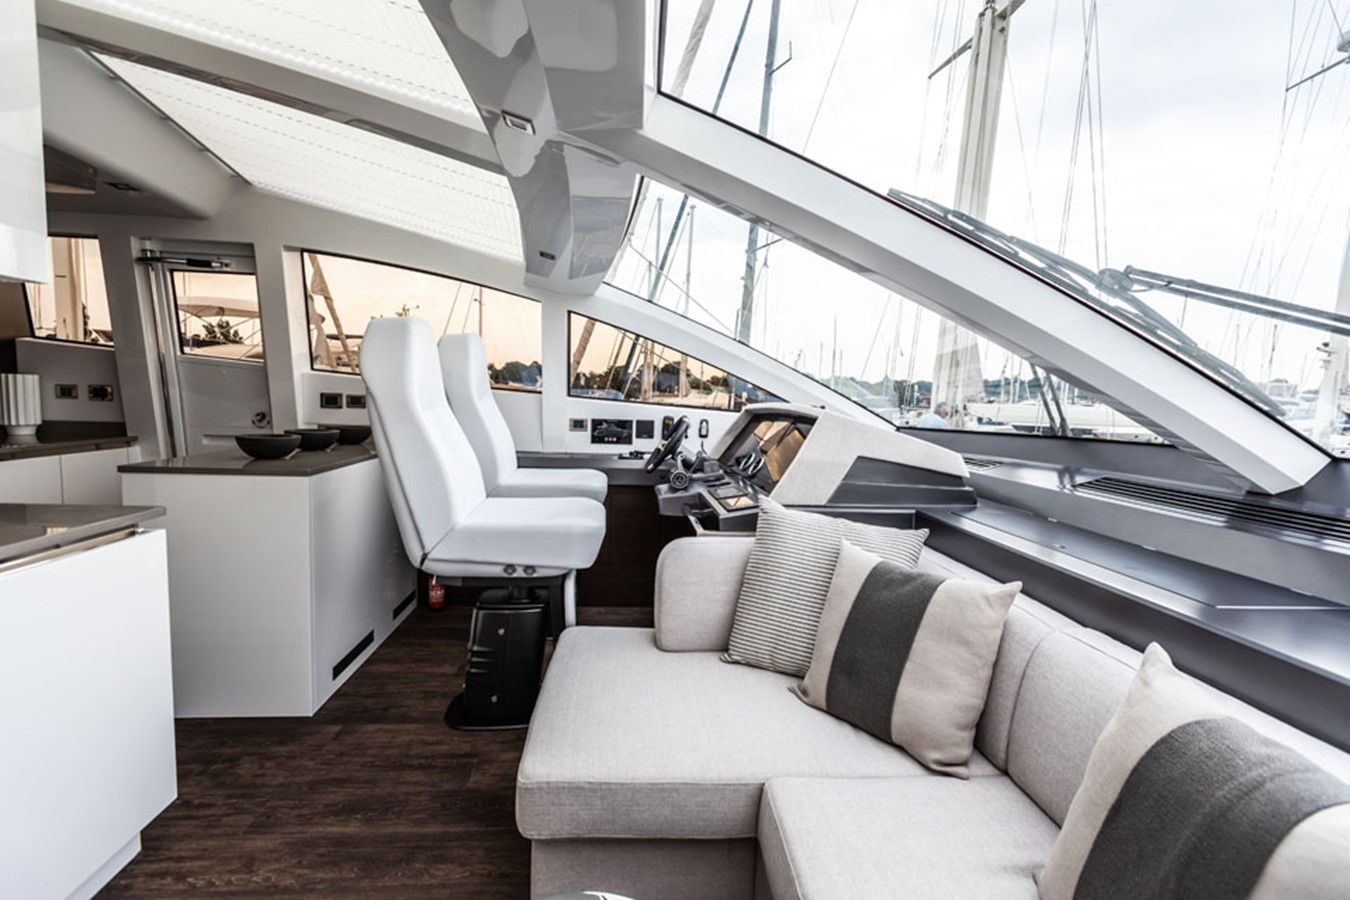 2019 PEARL MOTOR YACHTS Pearl 80 Motor Yacht 2615291